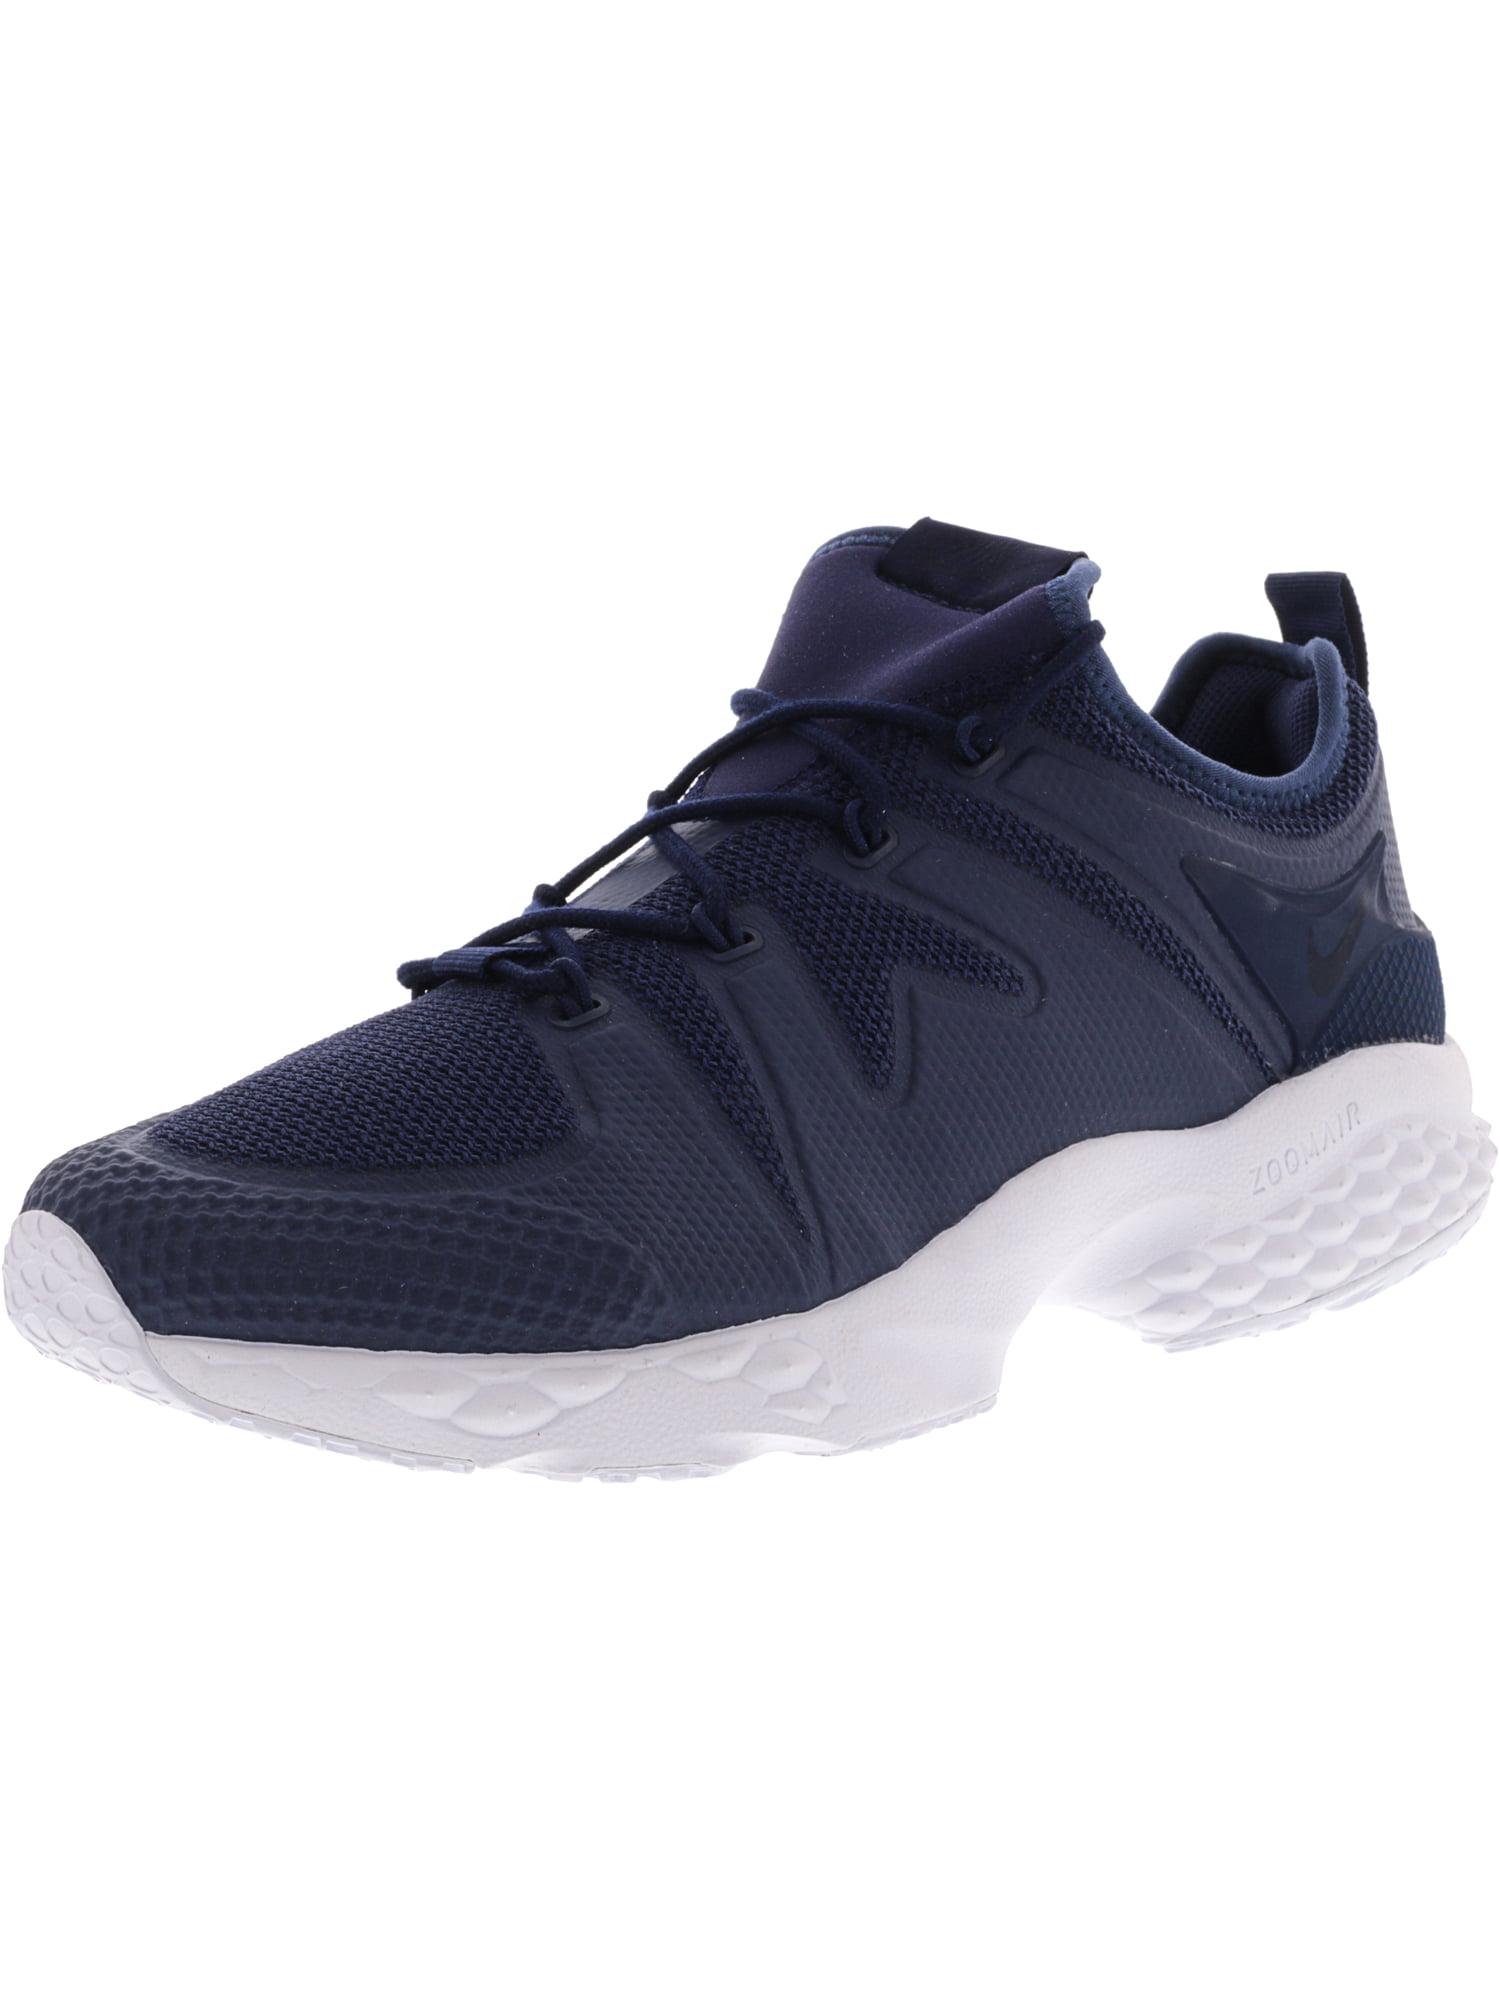 08af0770a26b4 Nike Men s Air Zoom Lwp 16 Cool Grey   Dark - White Ankle-High Fashion  Sneaker 10M